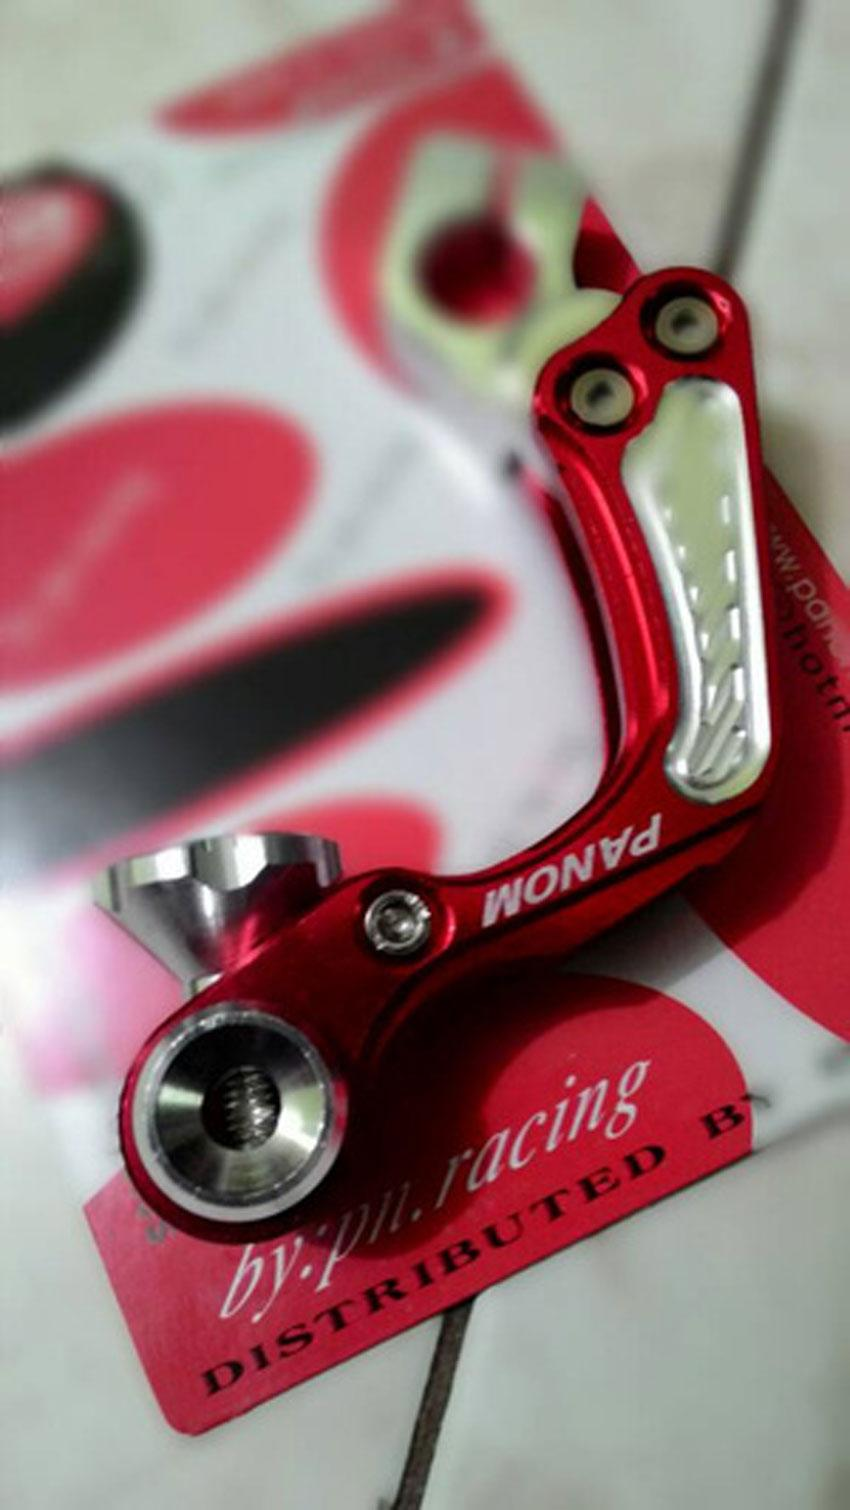 Features Paha Rem Belakang Matic Yamaha Panom Dan Harga Terbaru Universal Detail Gambar